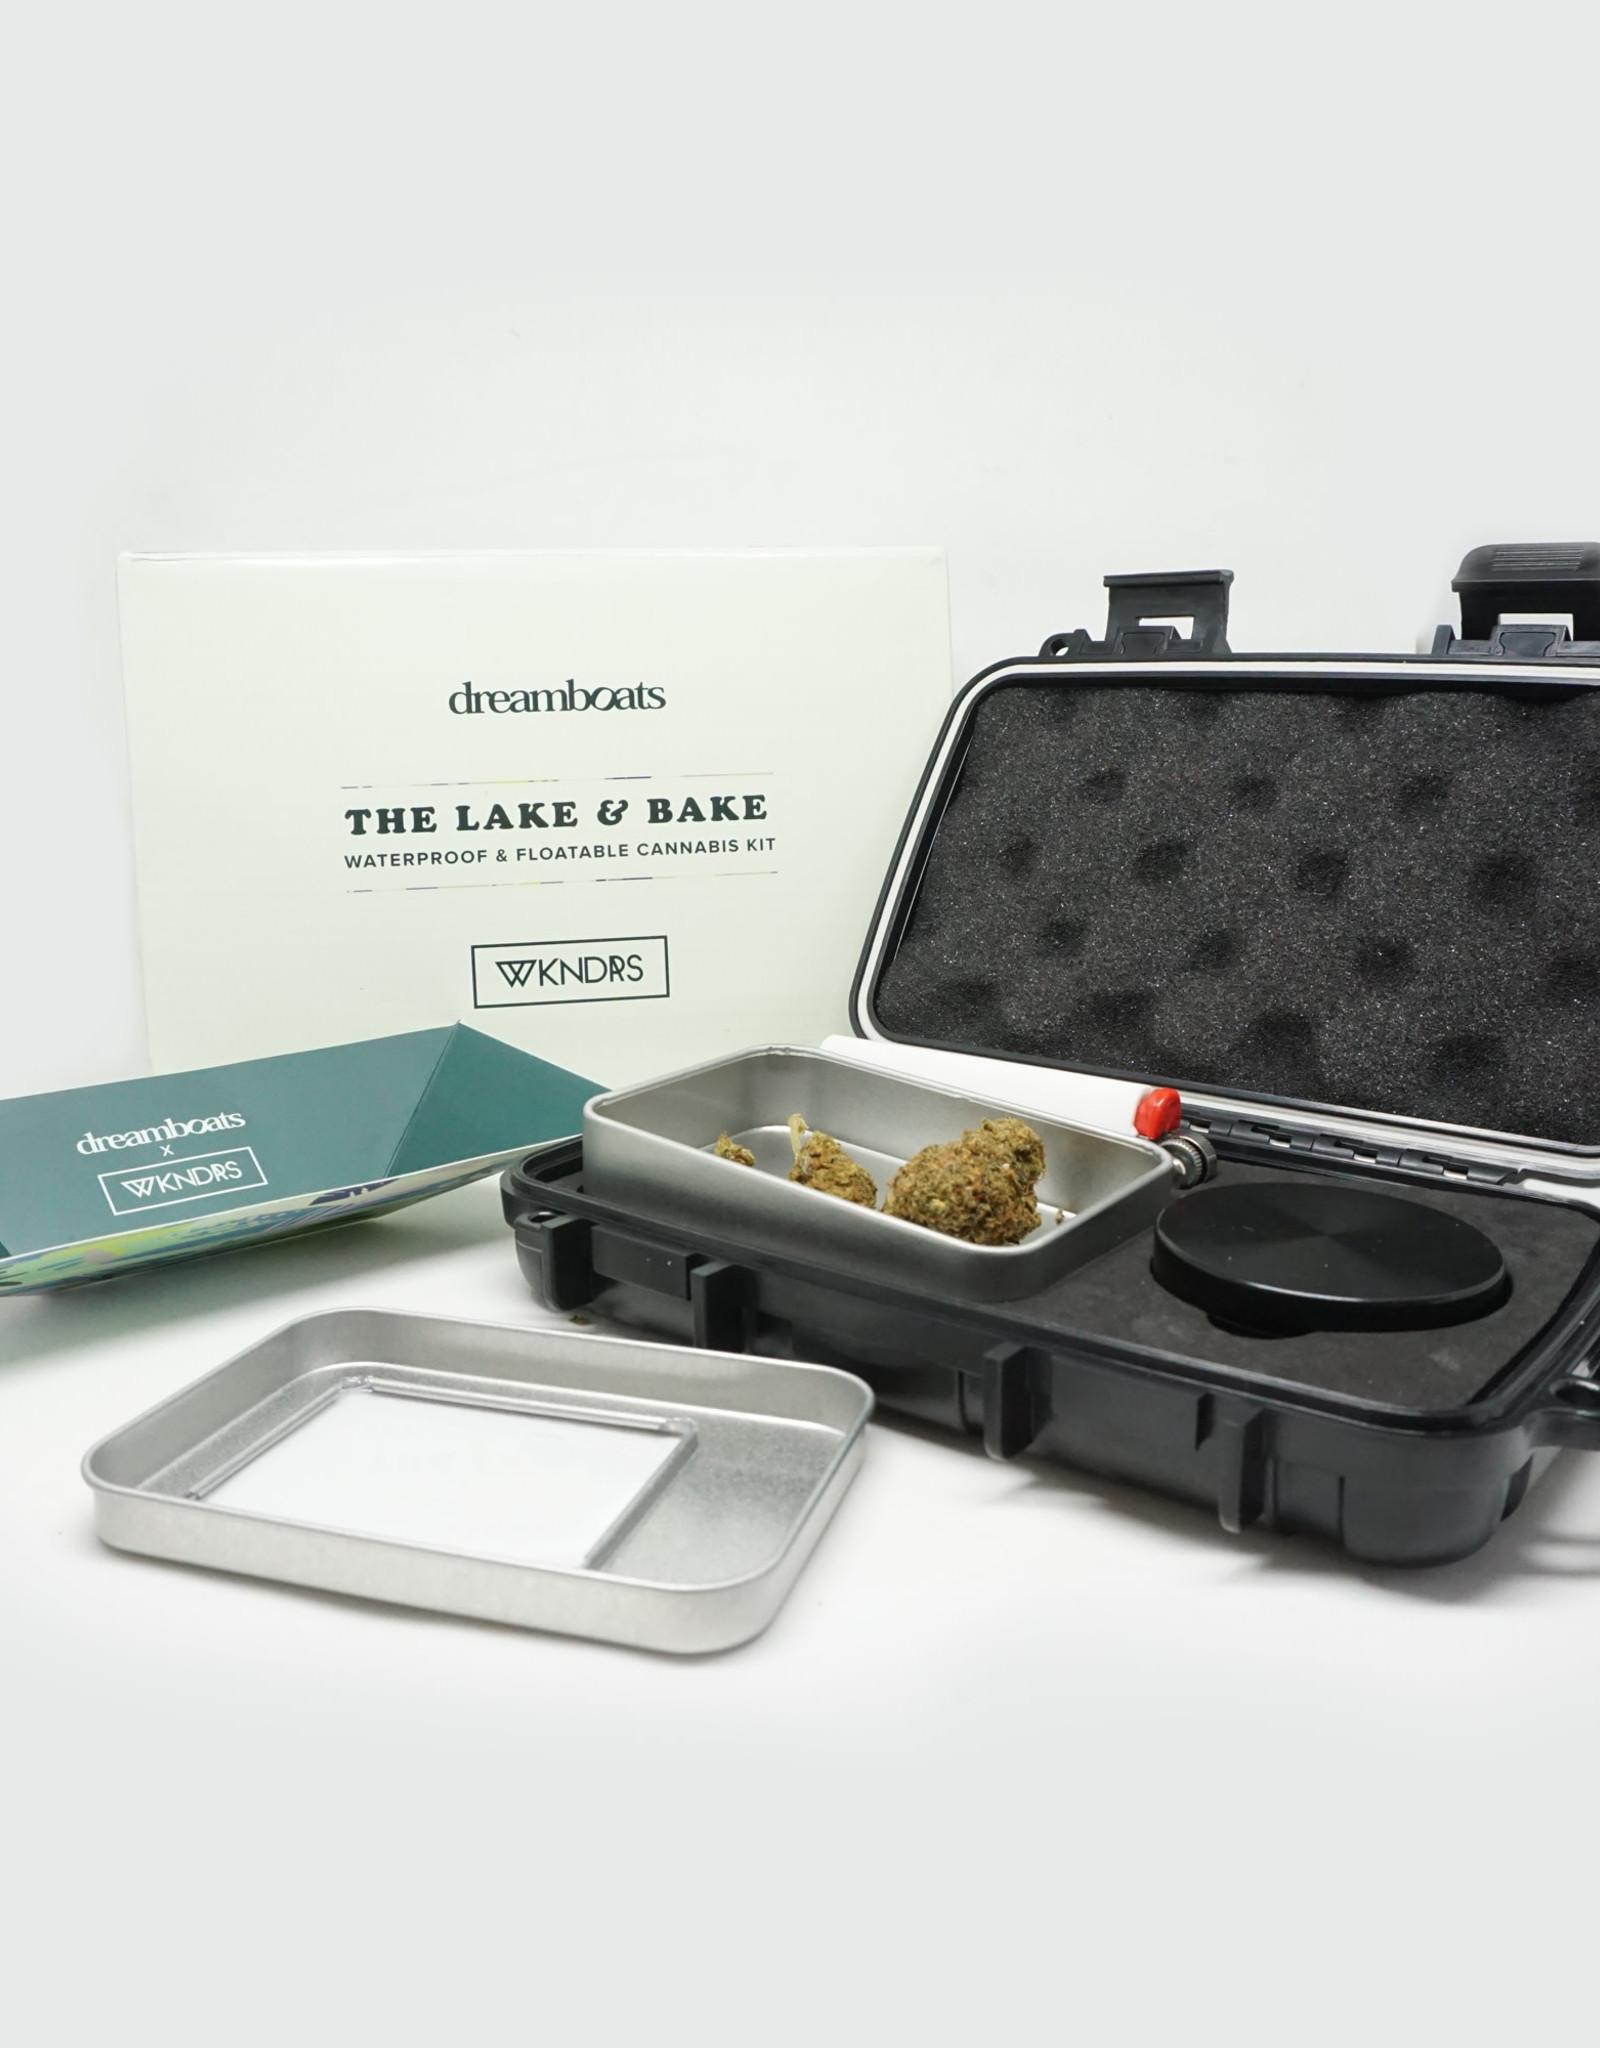 Dreamboats - LAKE & BAKE Kit